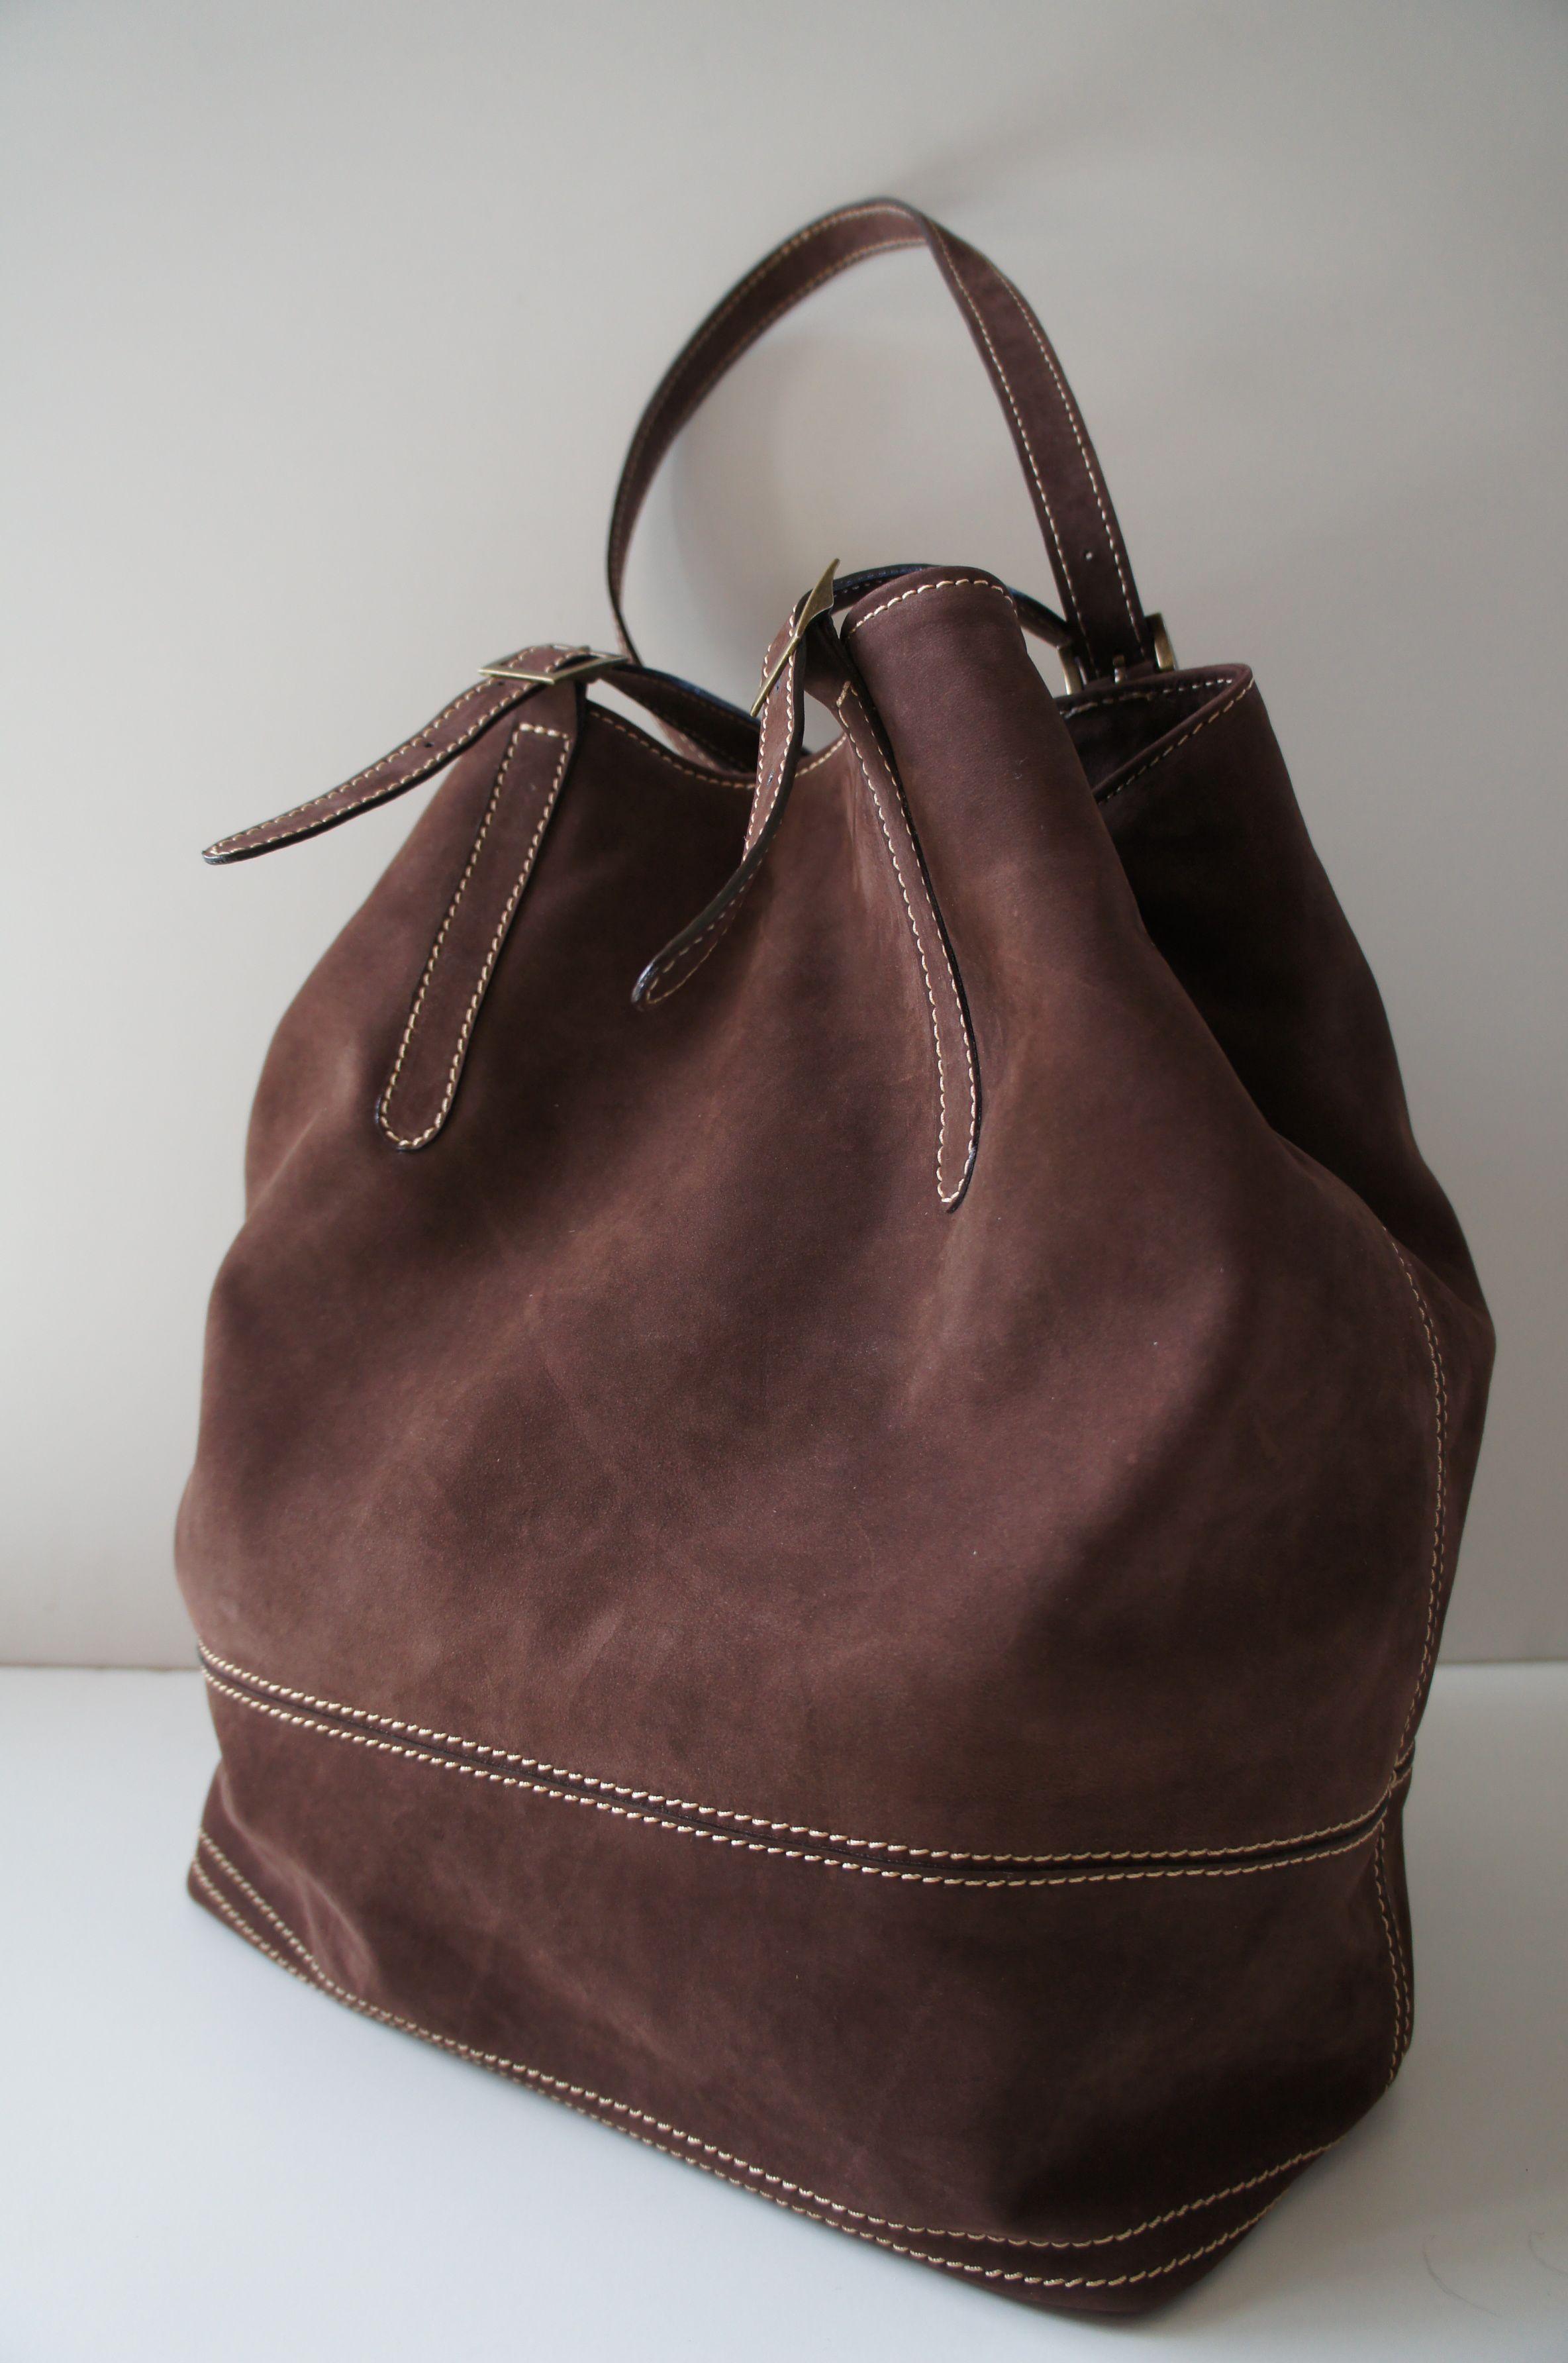 9ee93cee6 Bolso de gamuza de cuero chocolate. Asas ajuatables | bags | Bags ...